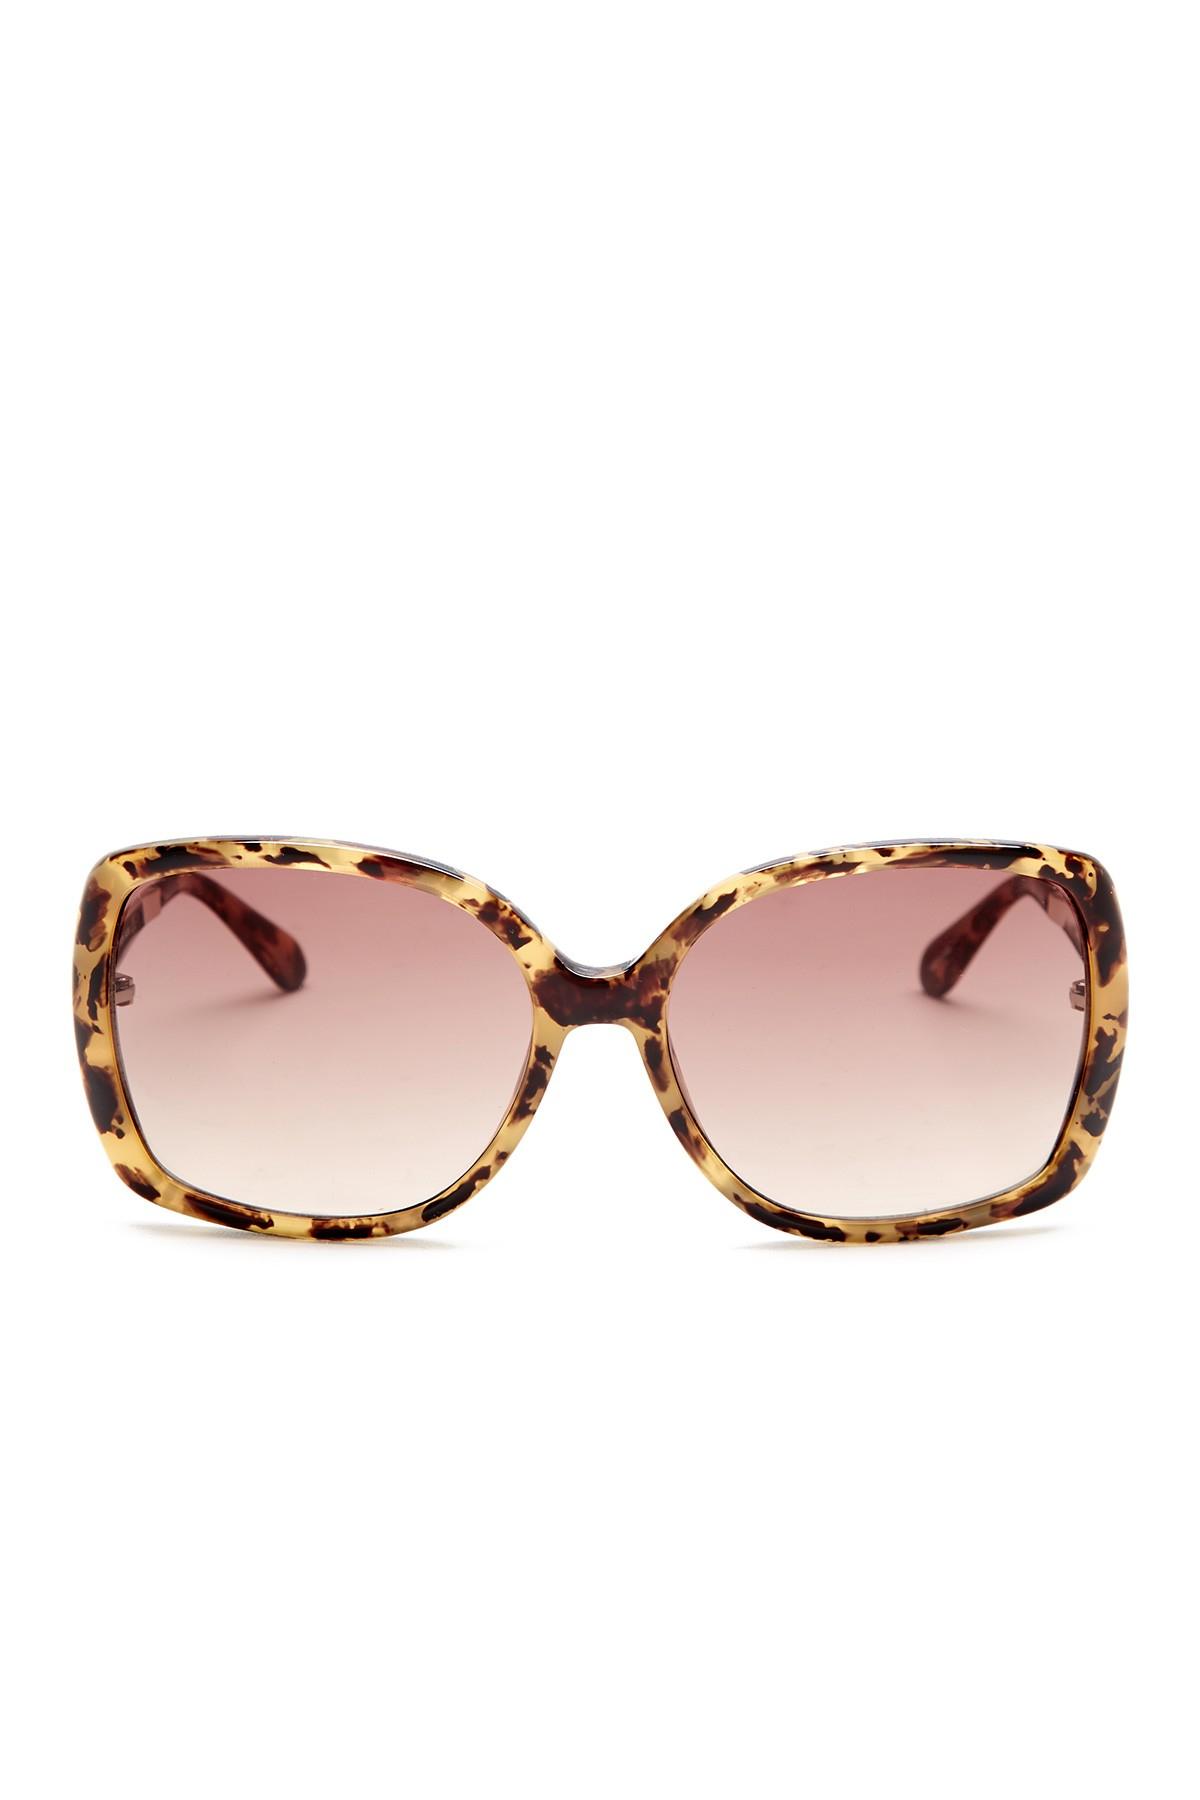 902ea26dc44b Lyst - Kate Spade 59mm Margita Sunglasses